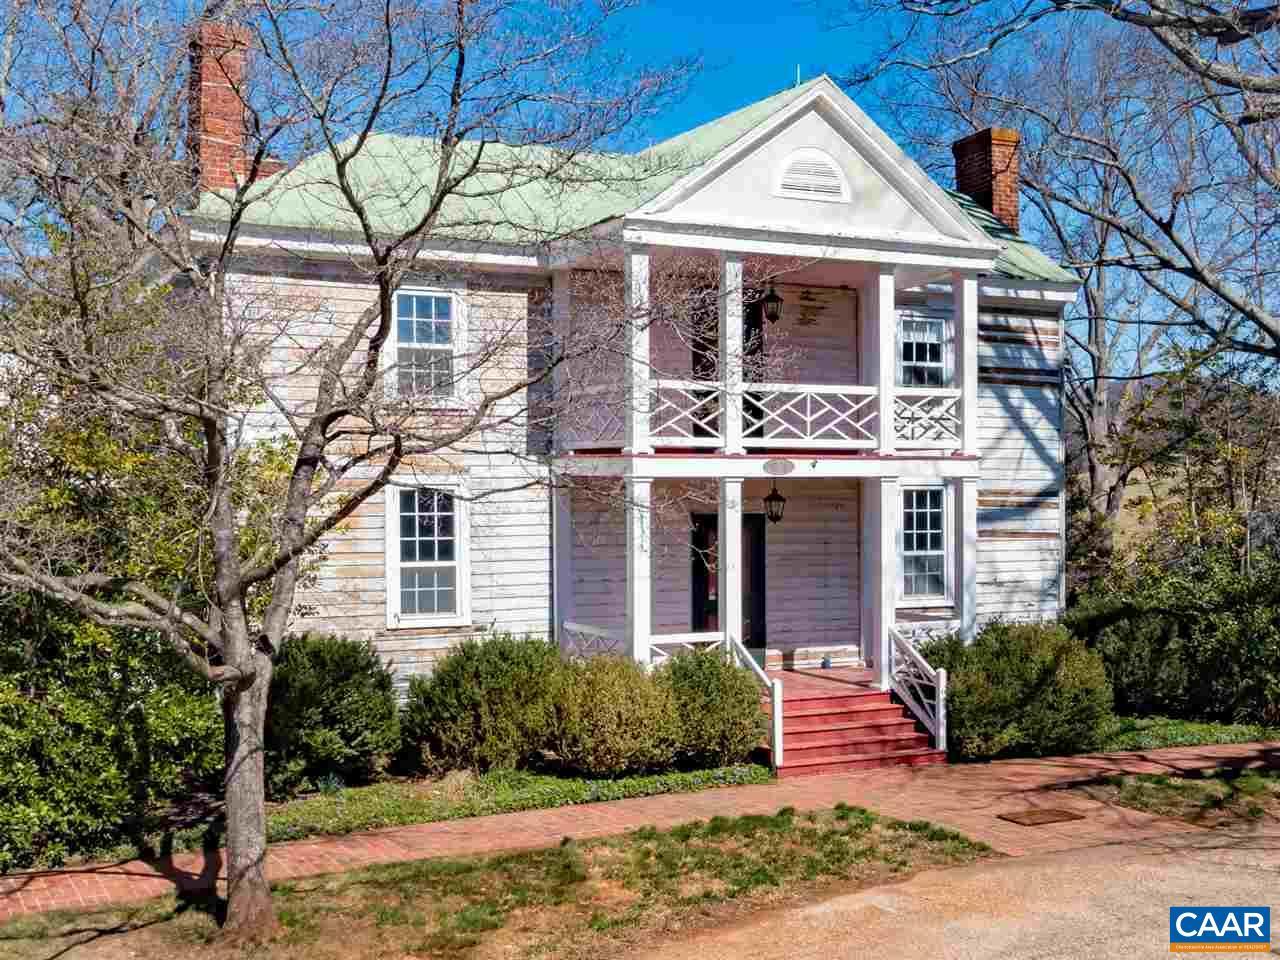 home for sale , MLS #555447, 1801 Bundoran Dr